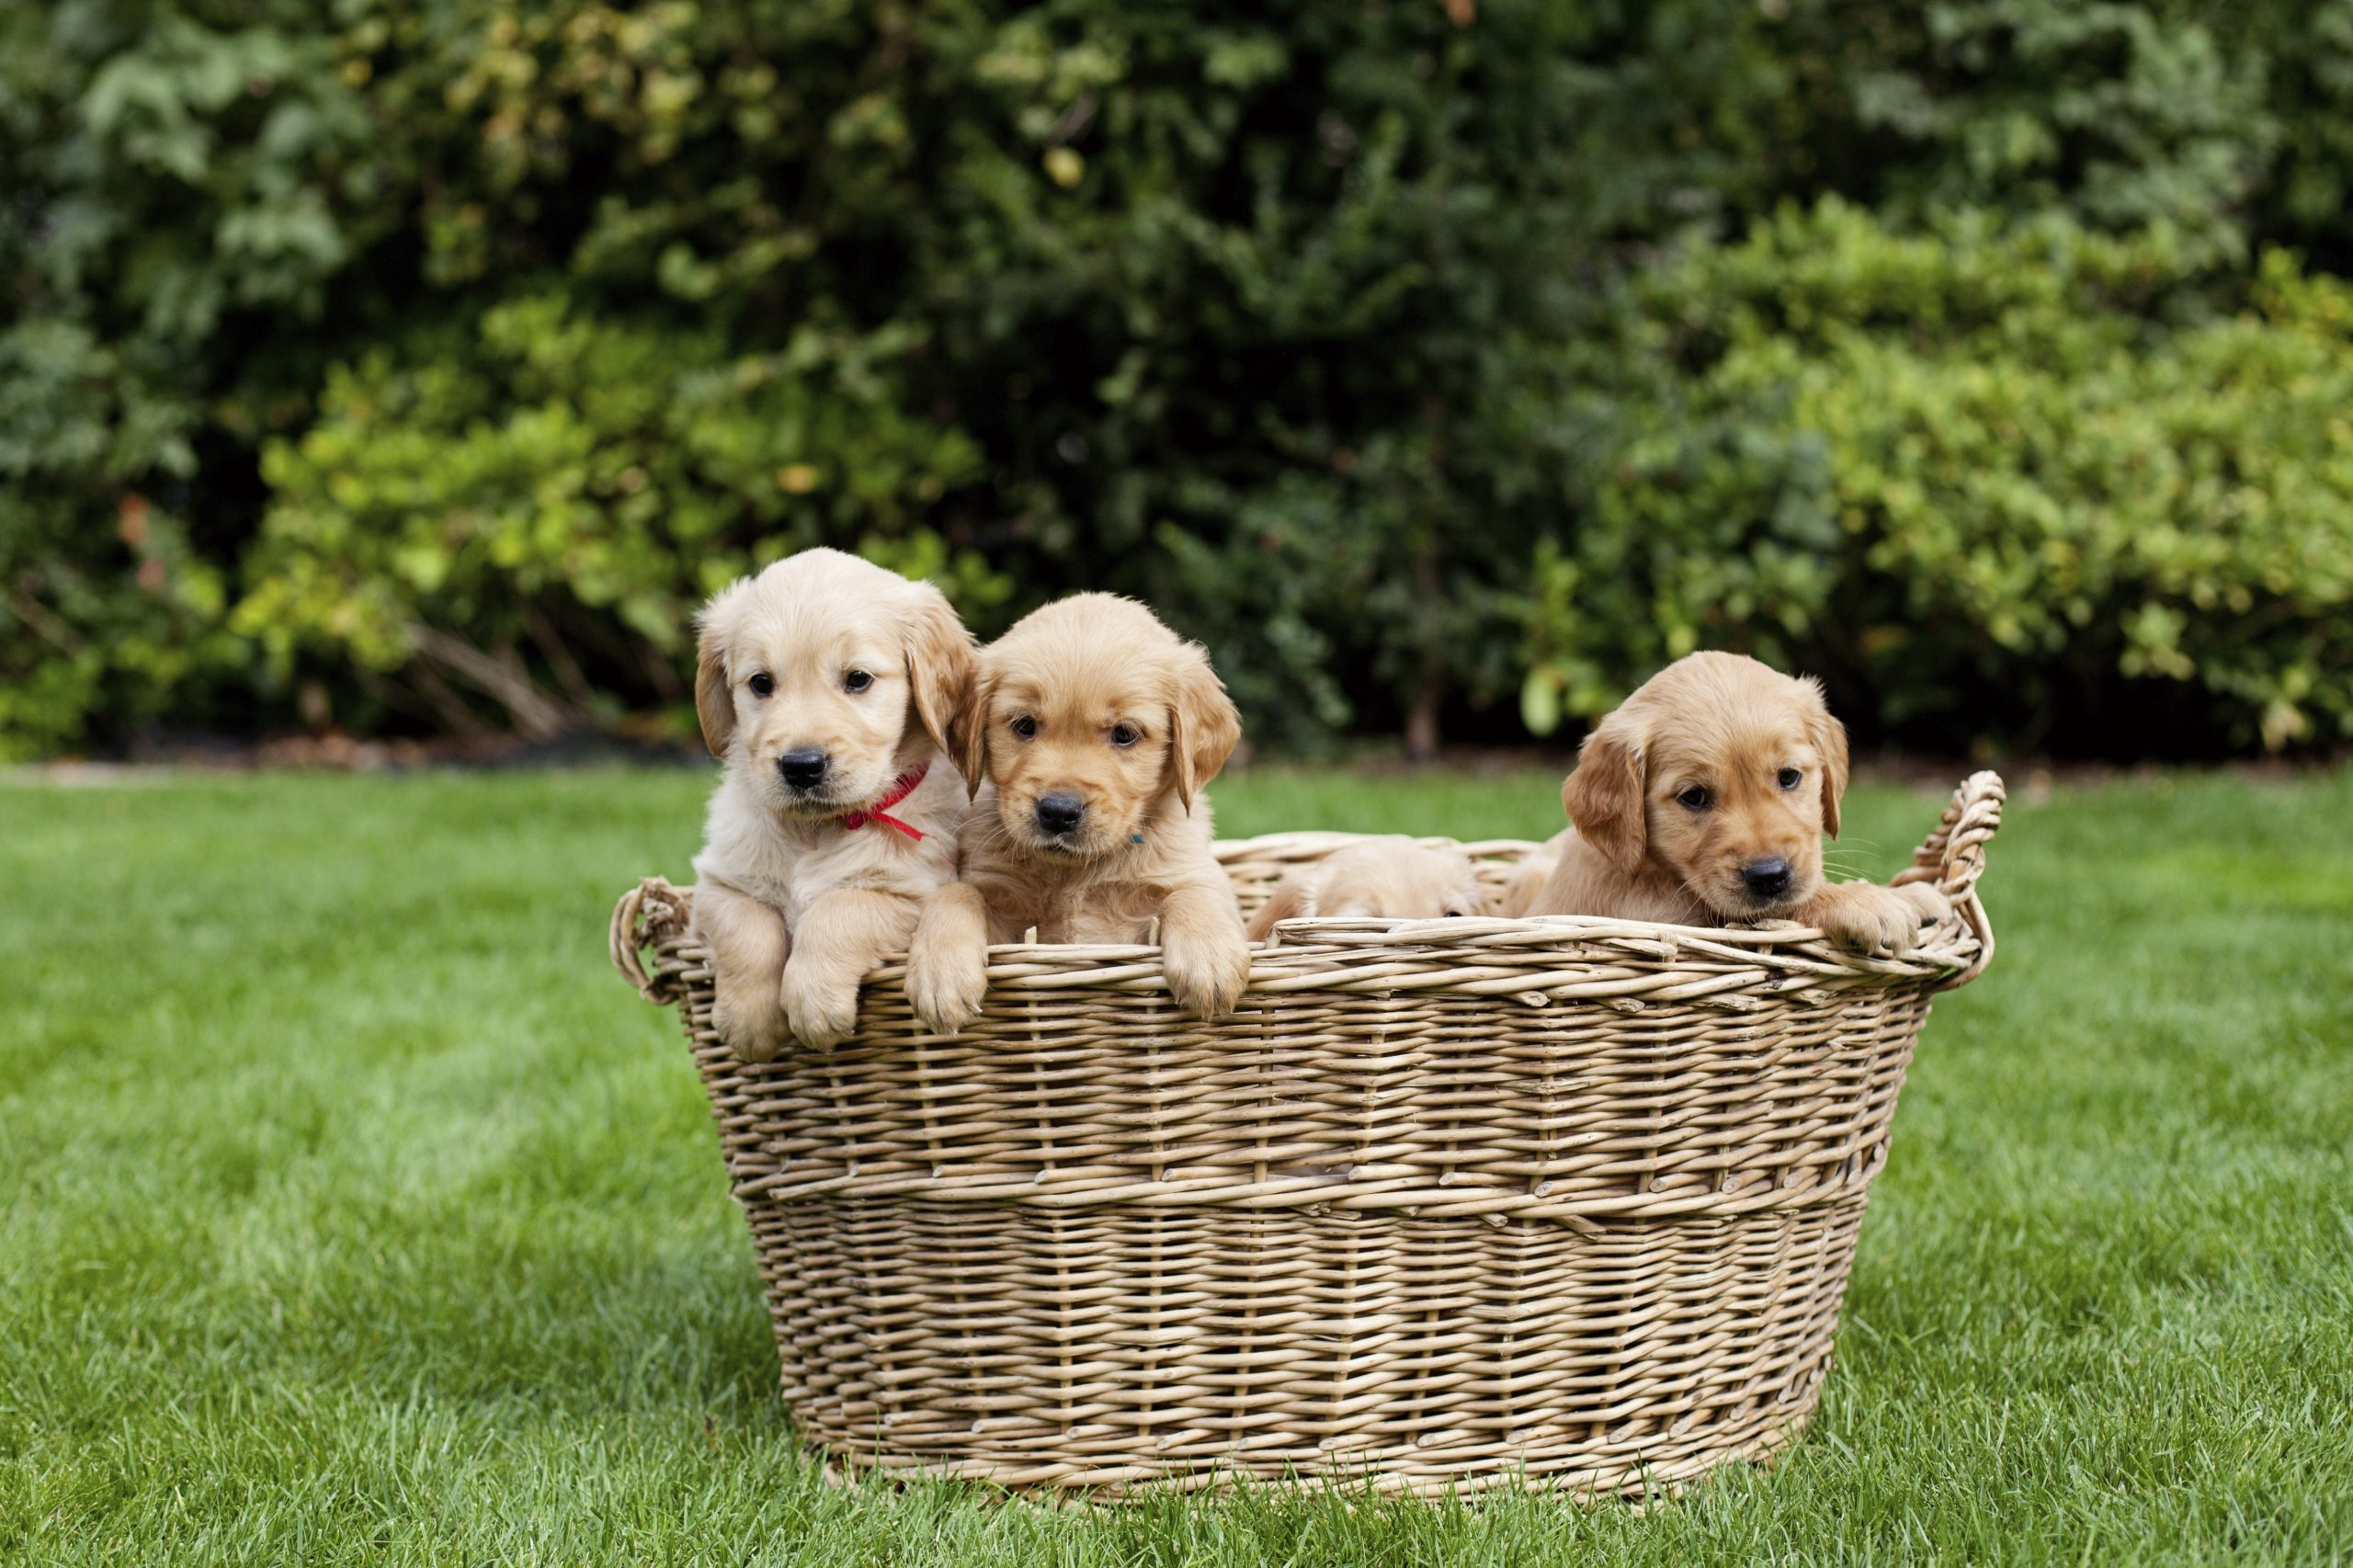 Golden retriever puppies in a basket.